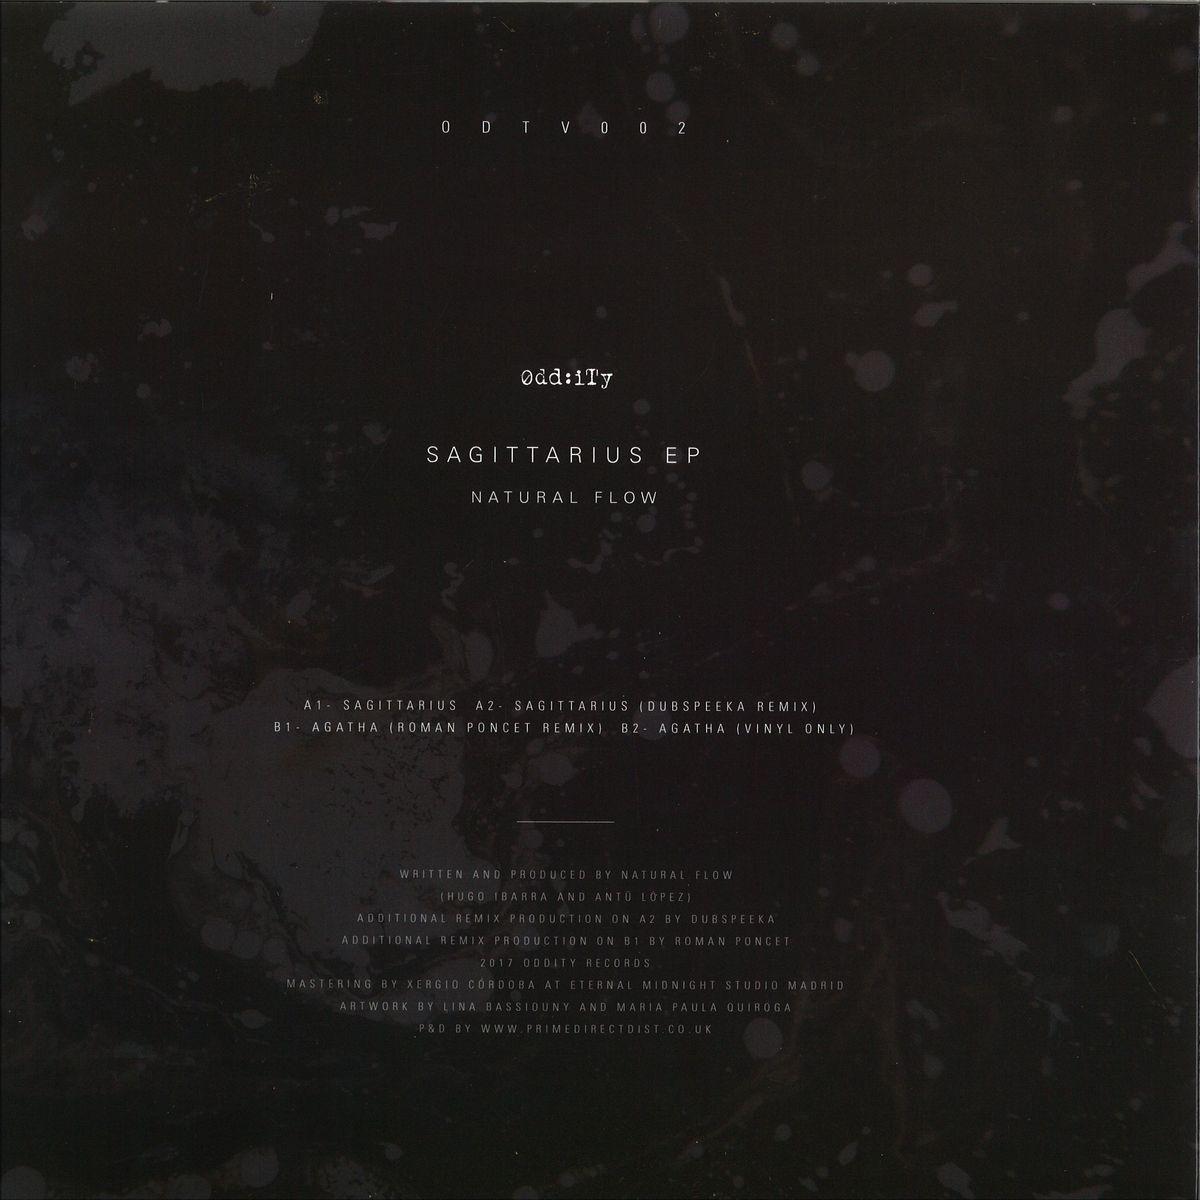 Natural Flow Sagittarius Ep Oddity Records Odtv002 Vinyl